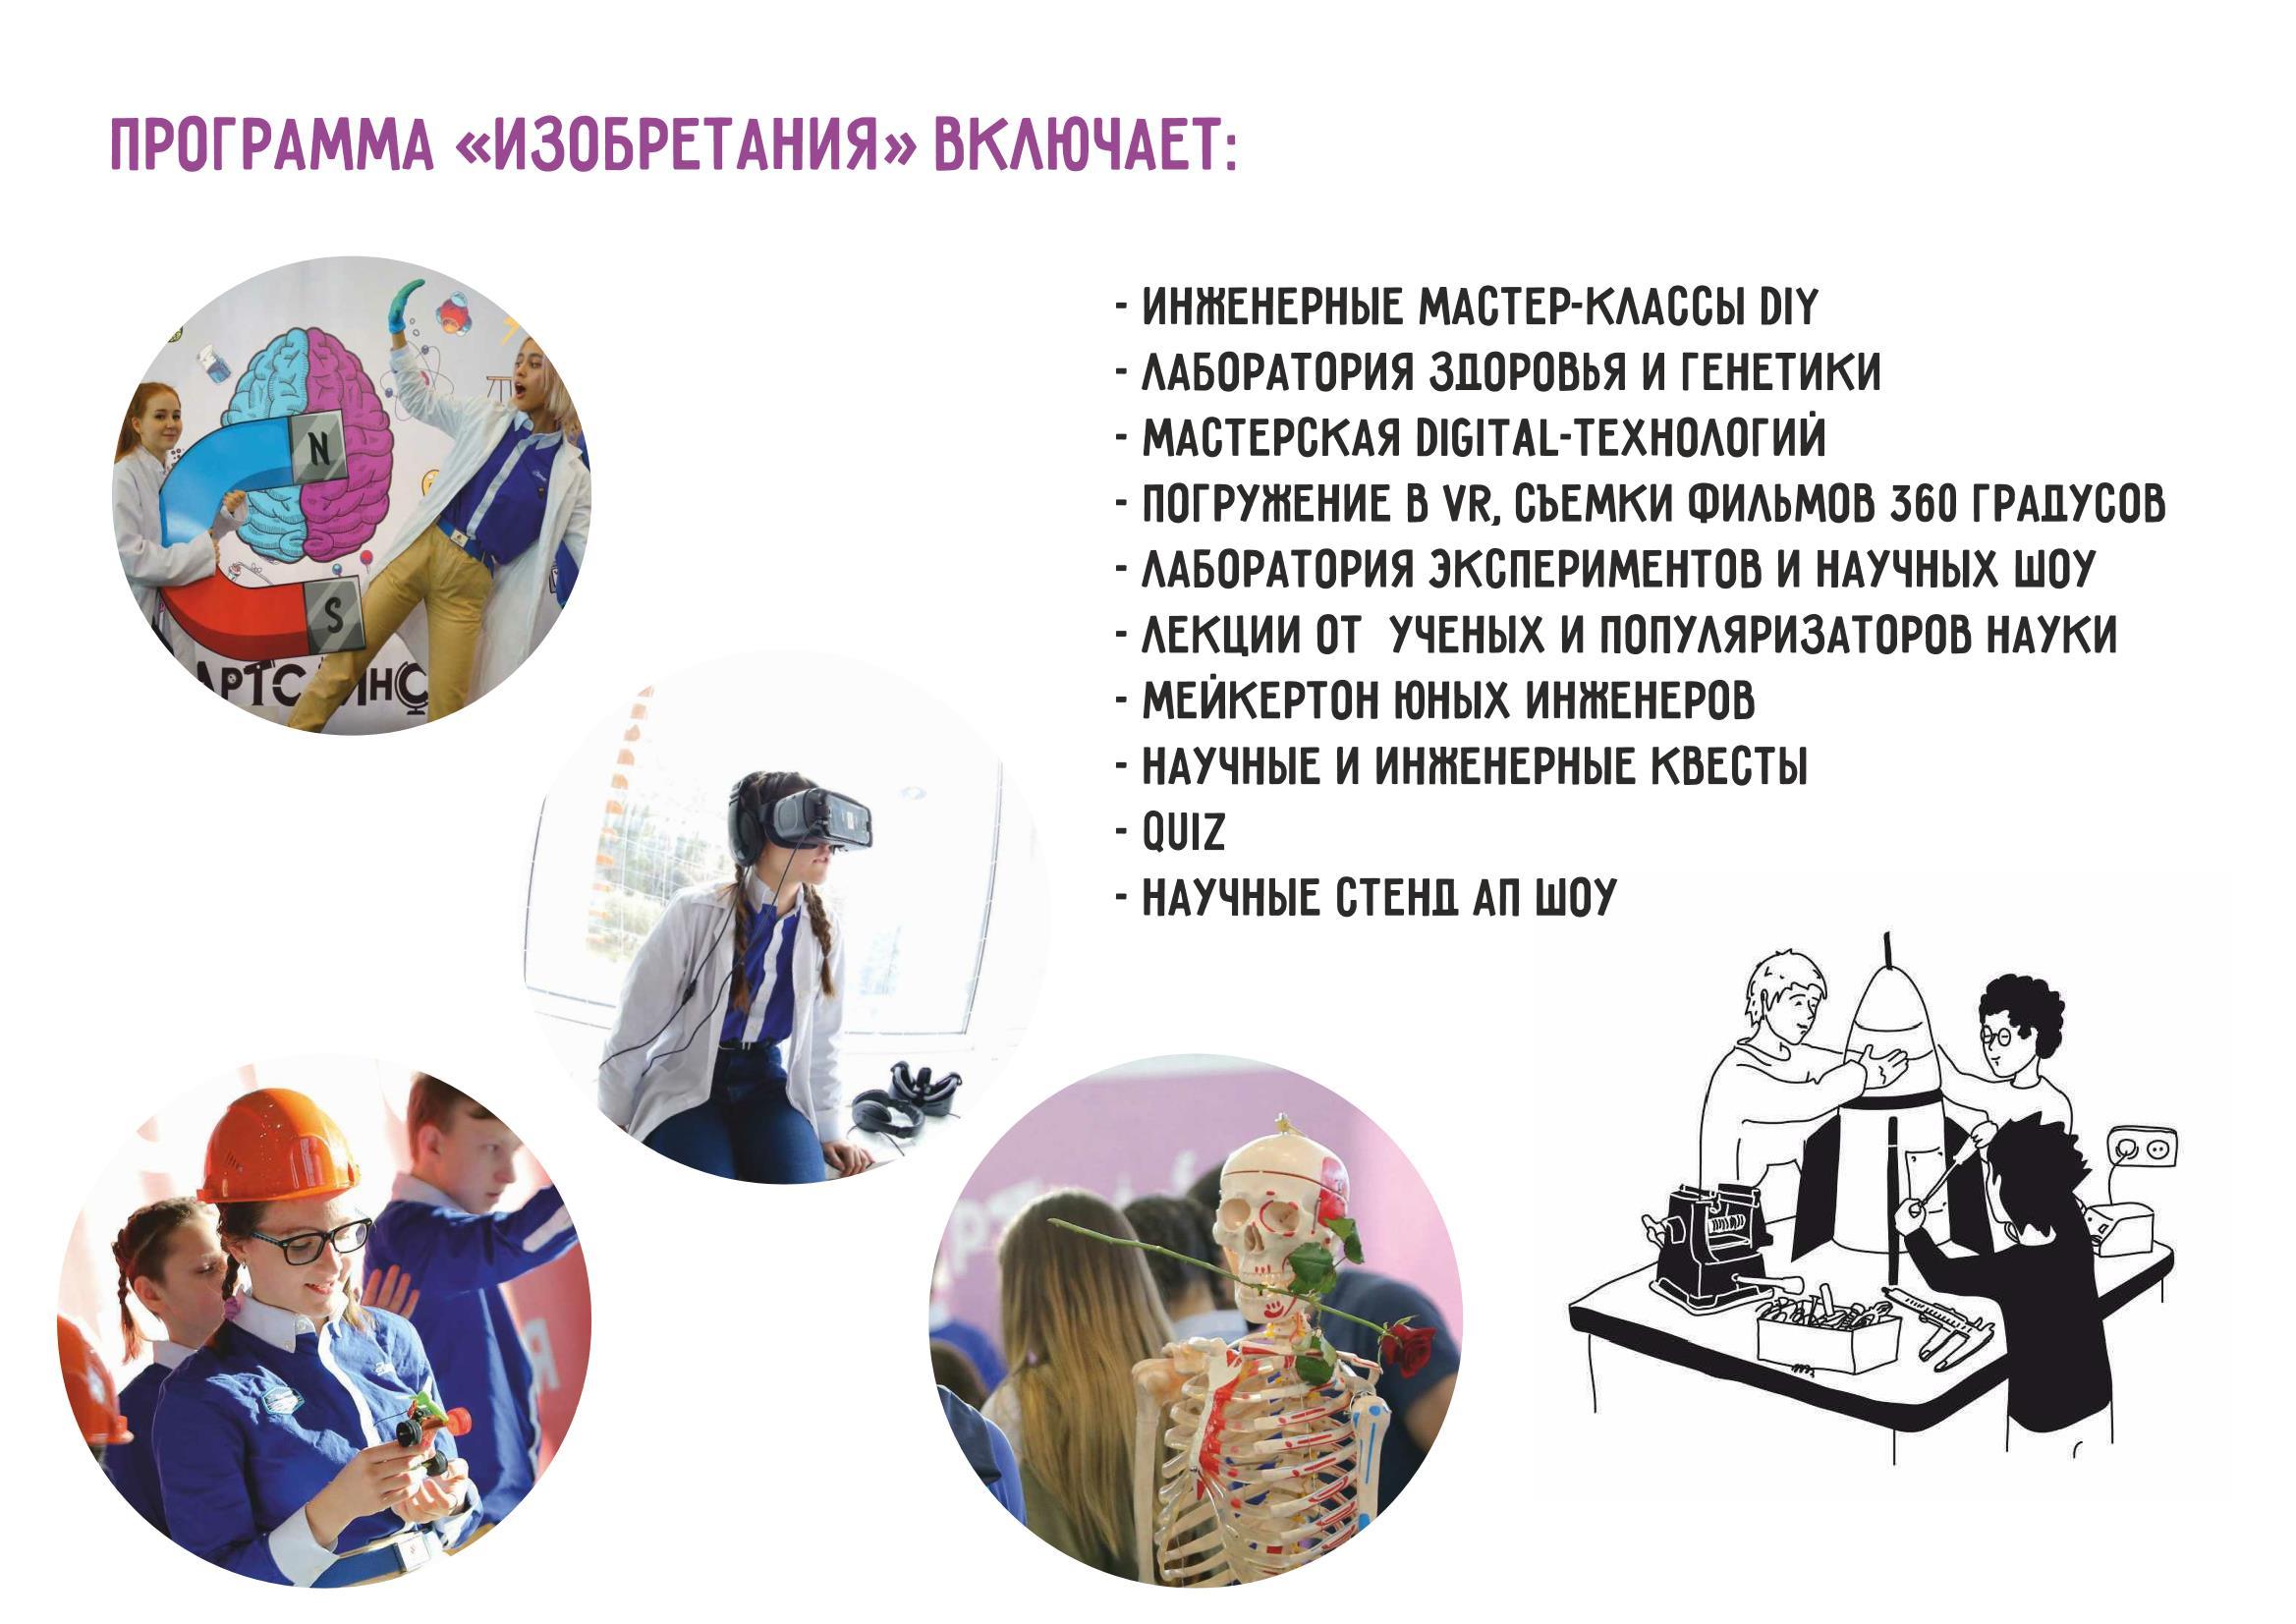 Презентация Изобретания 2021_Page_7